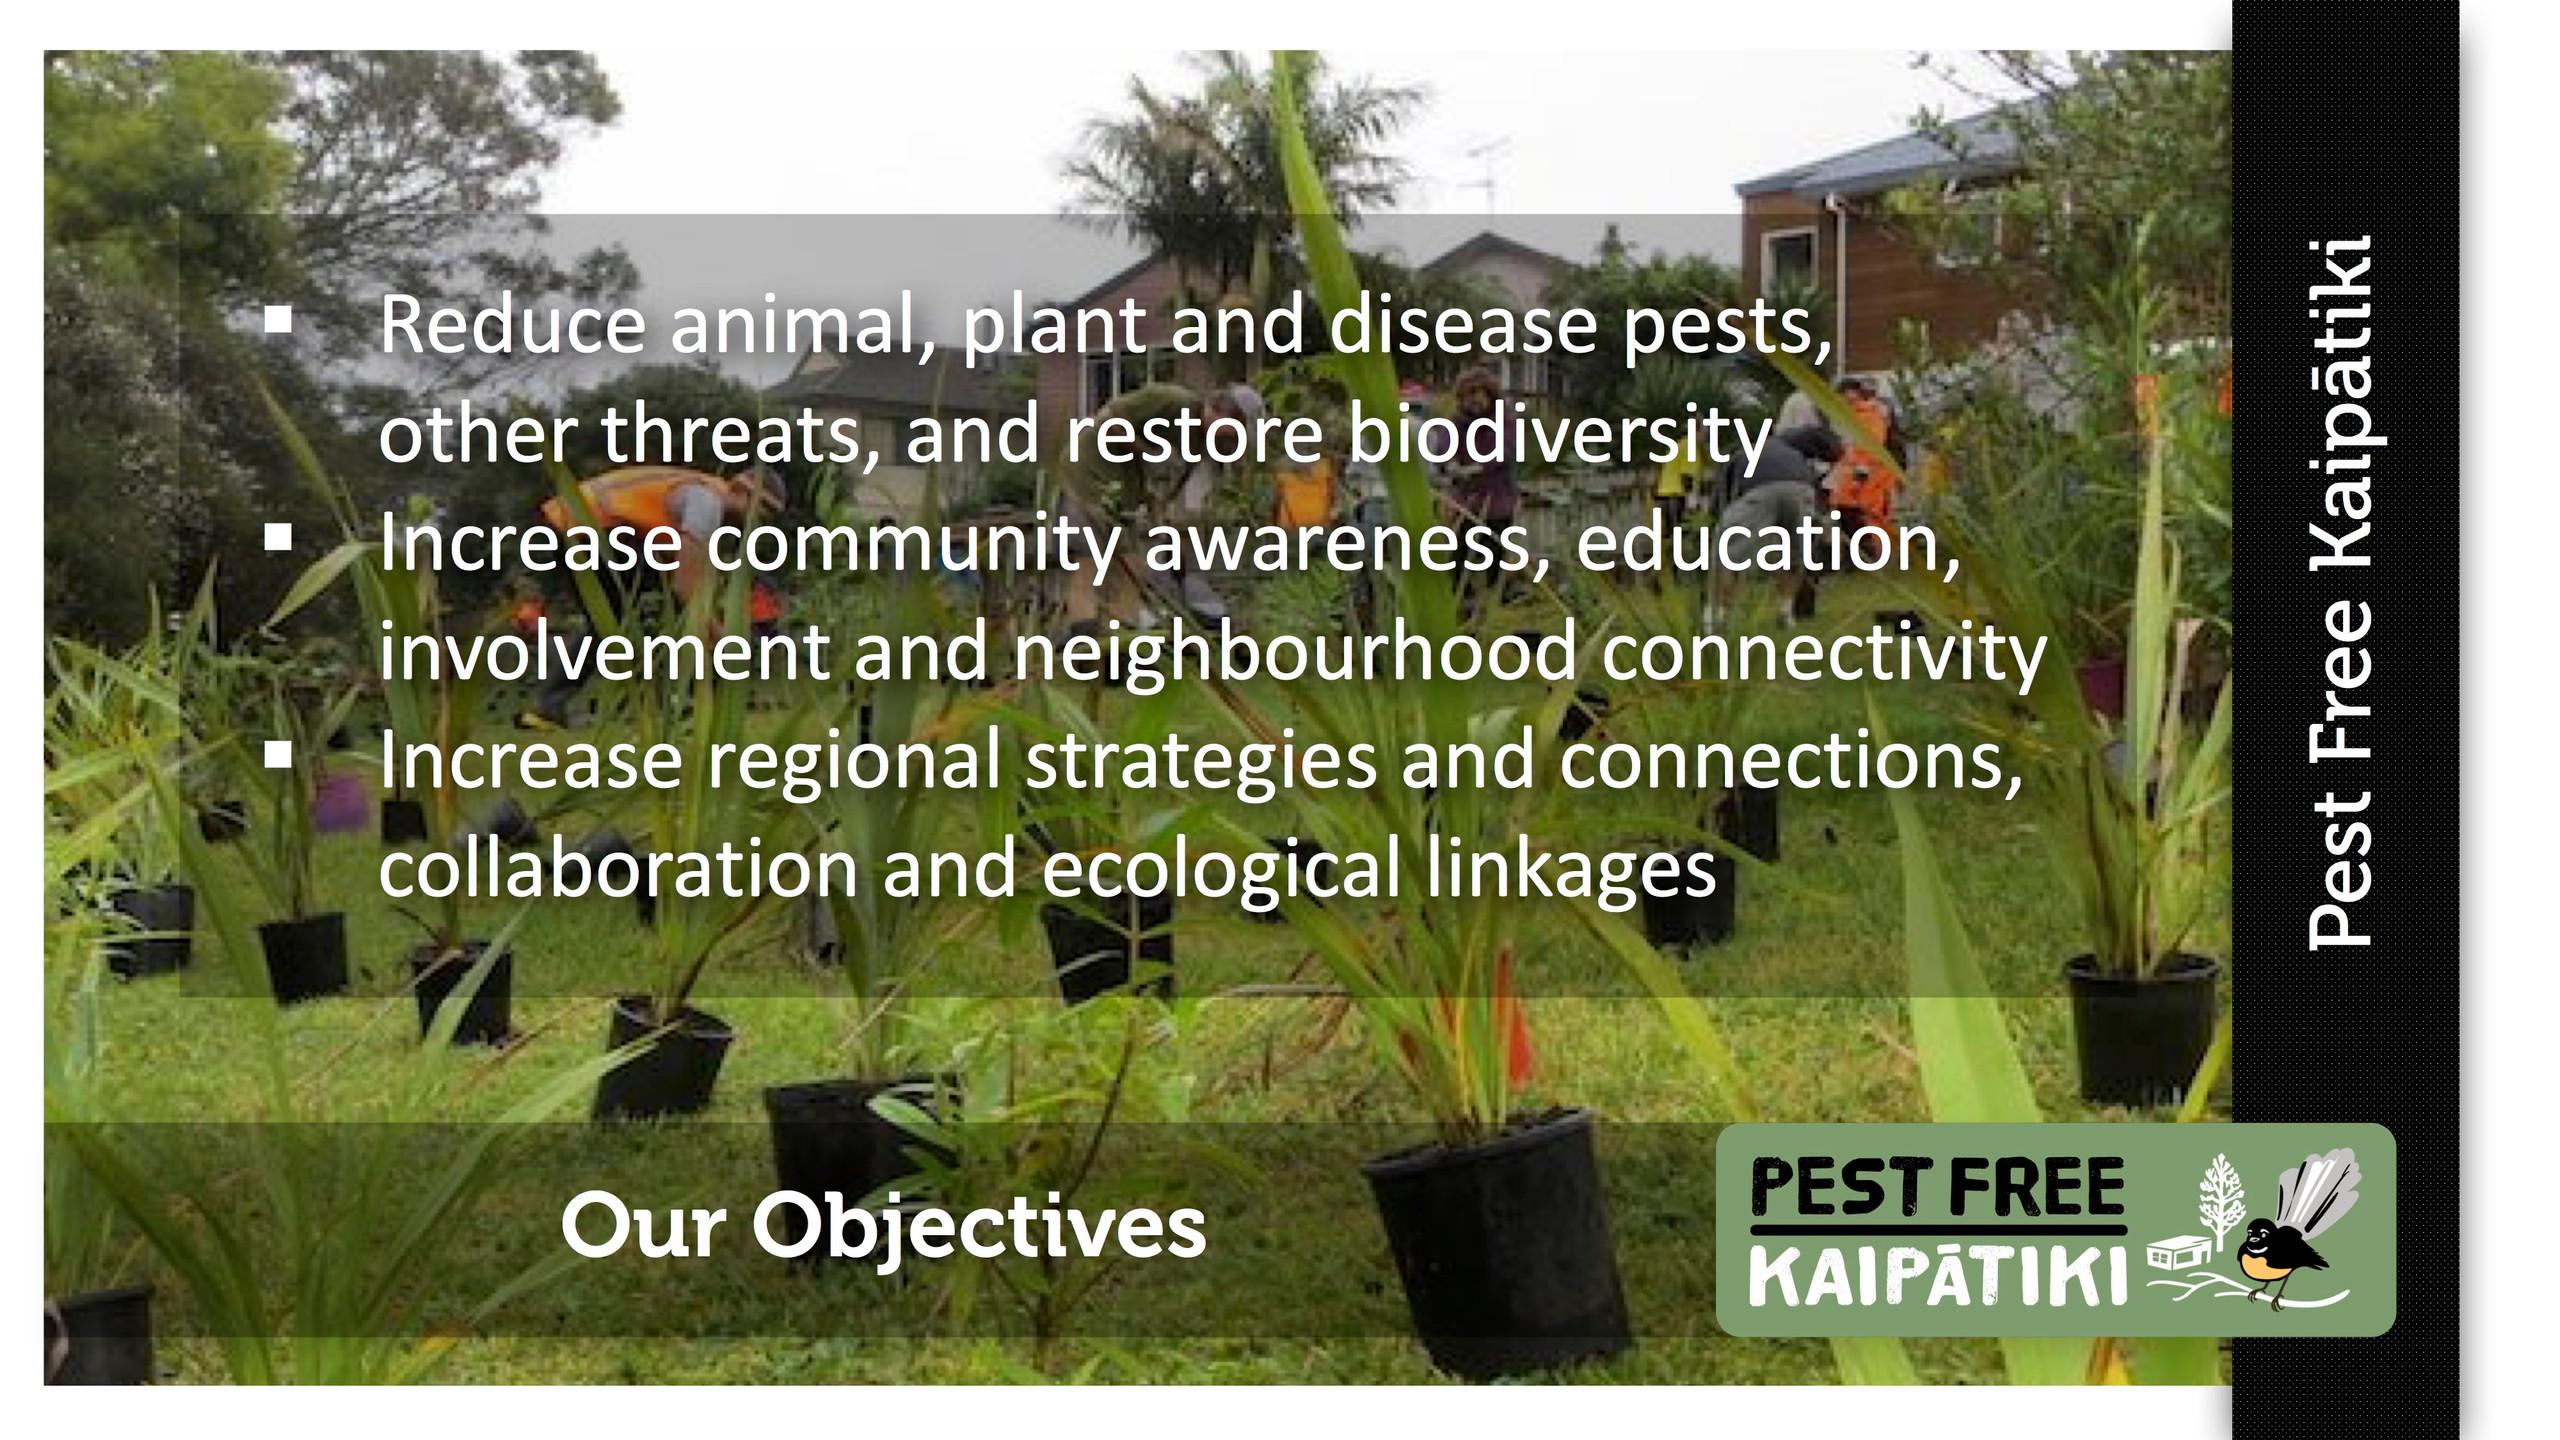 Pest Free Kaipatiki-Pestival-slide5